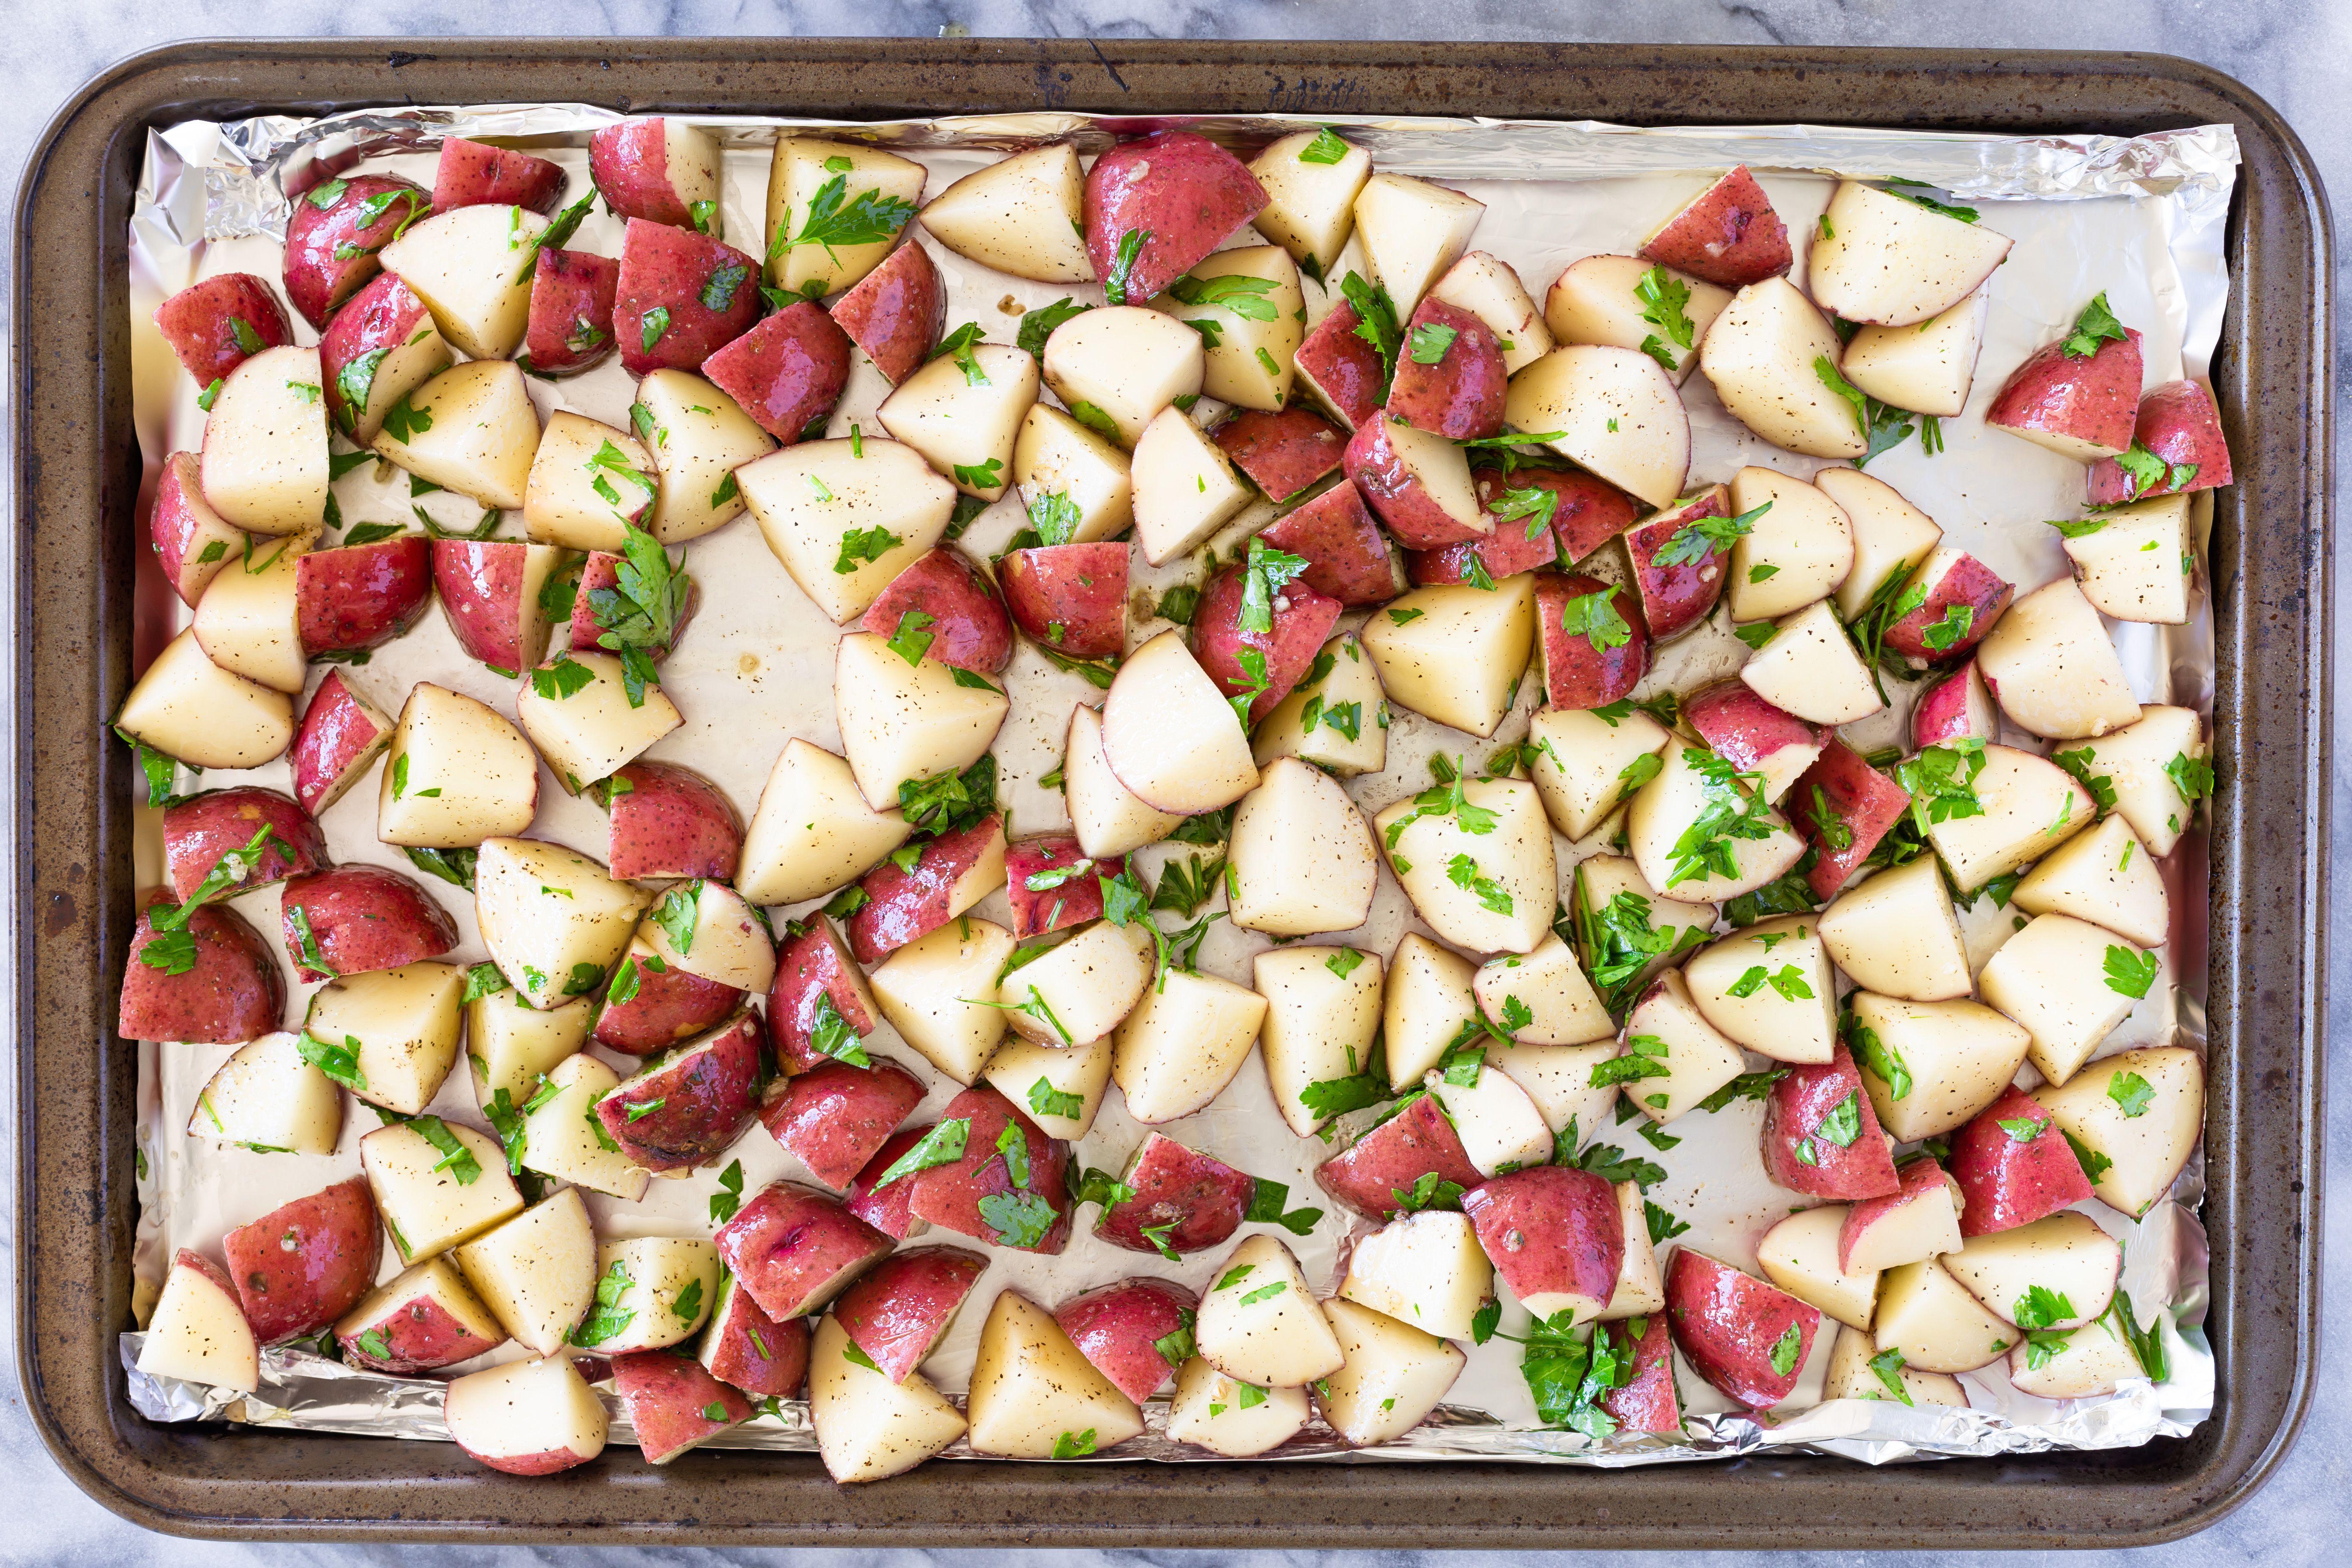 Sheet pan roasted potatoes.